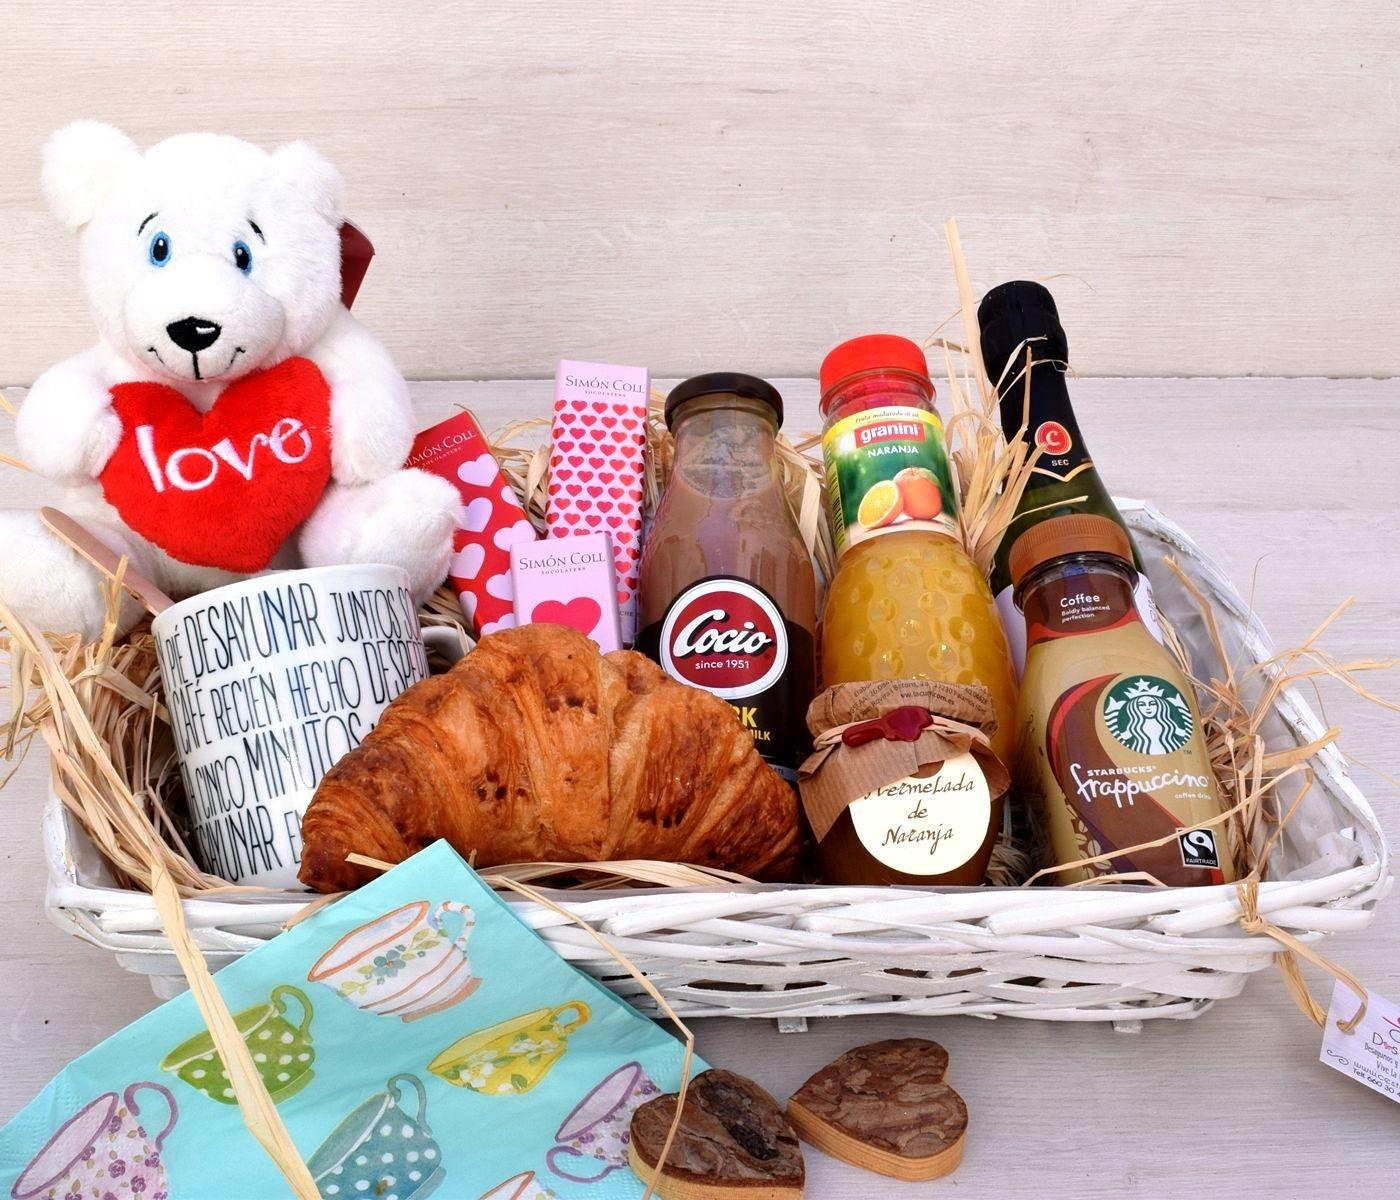 8 Ideas de negocio para San Valentín